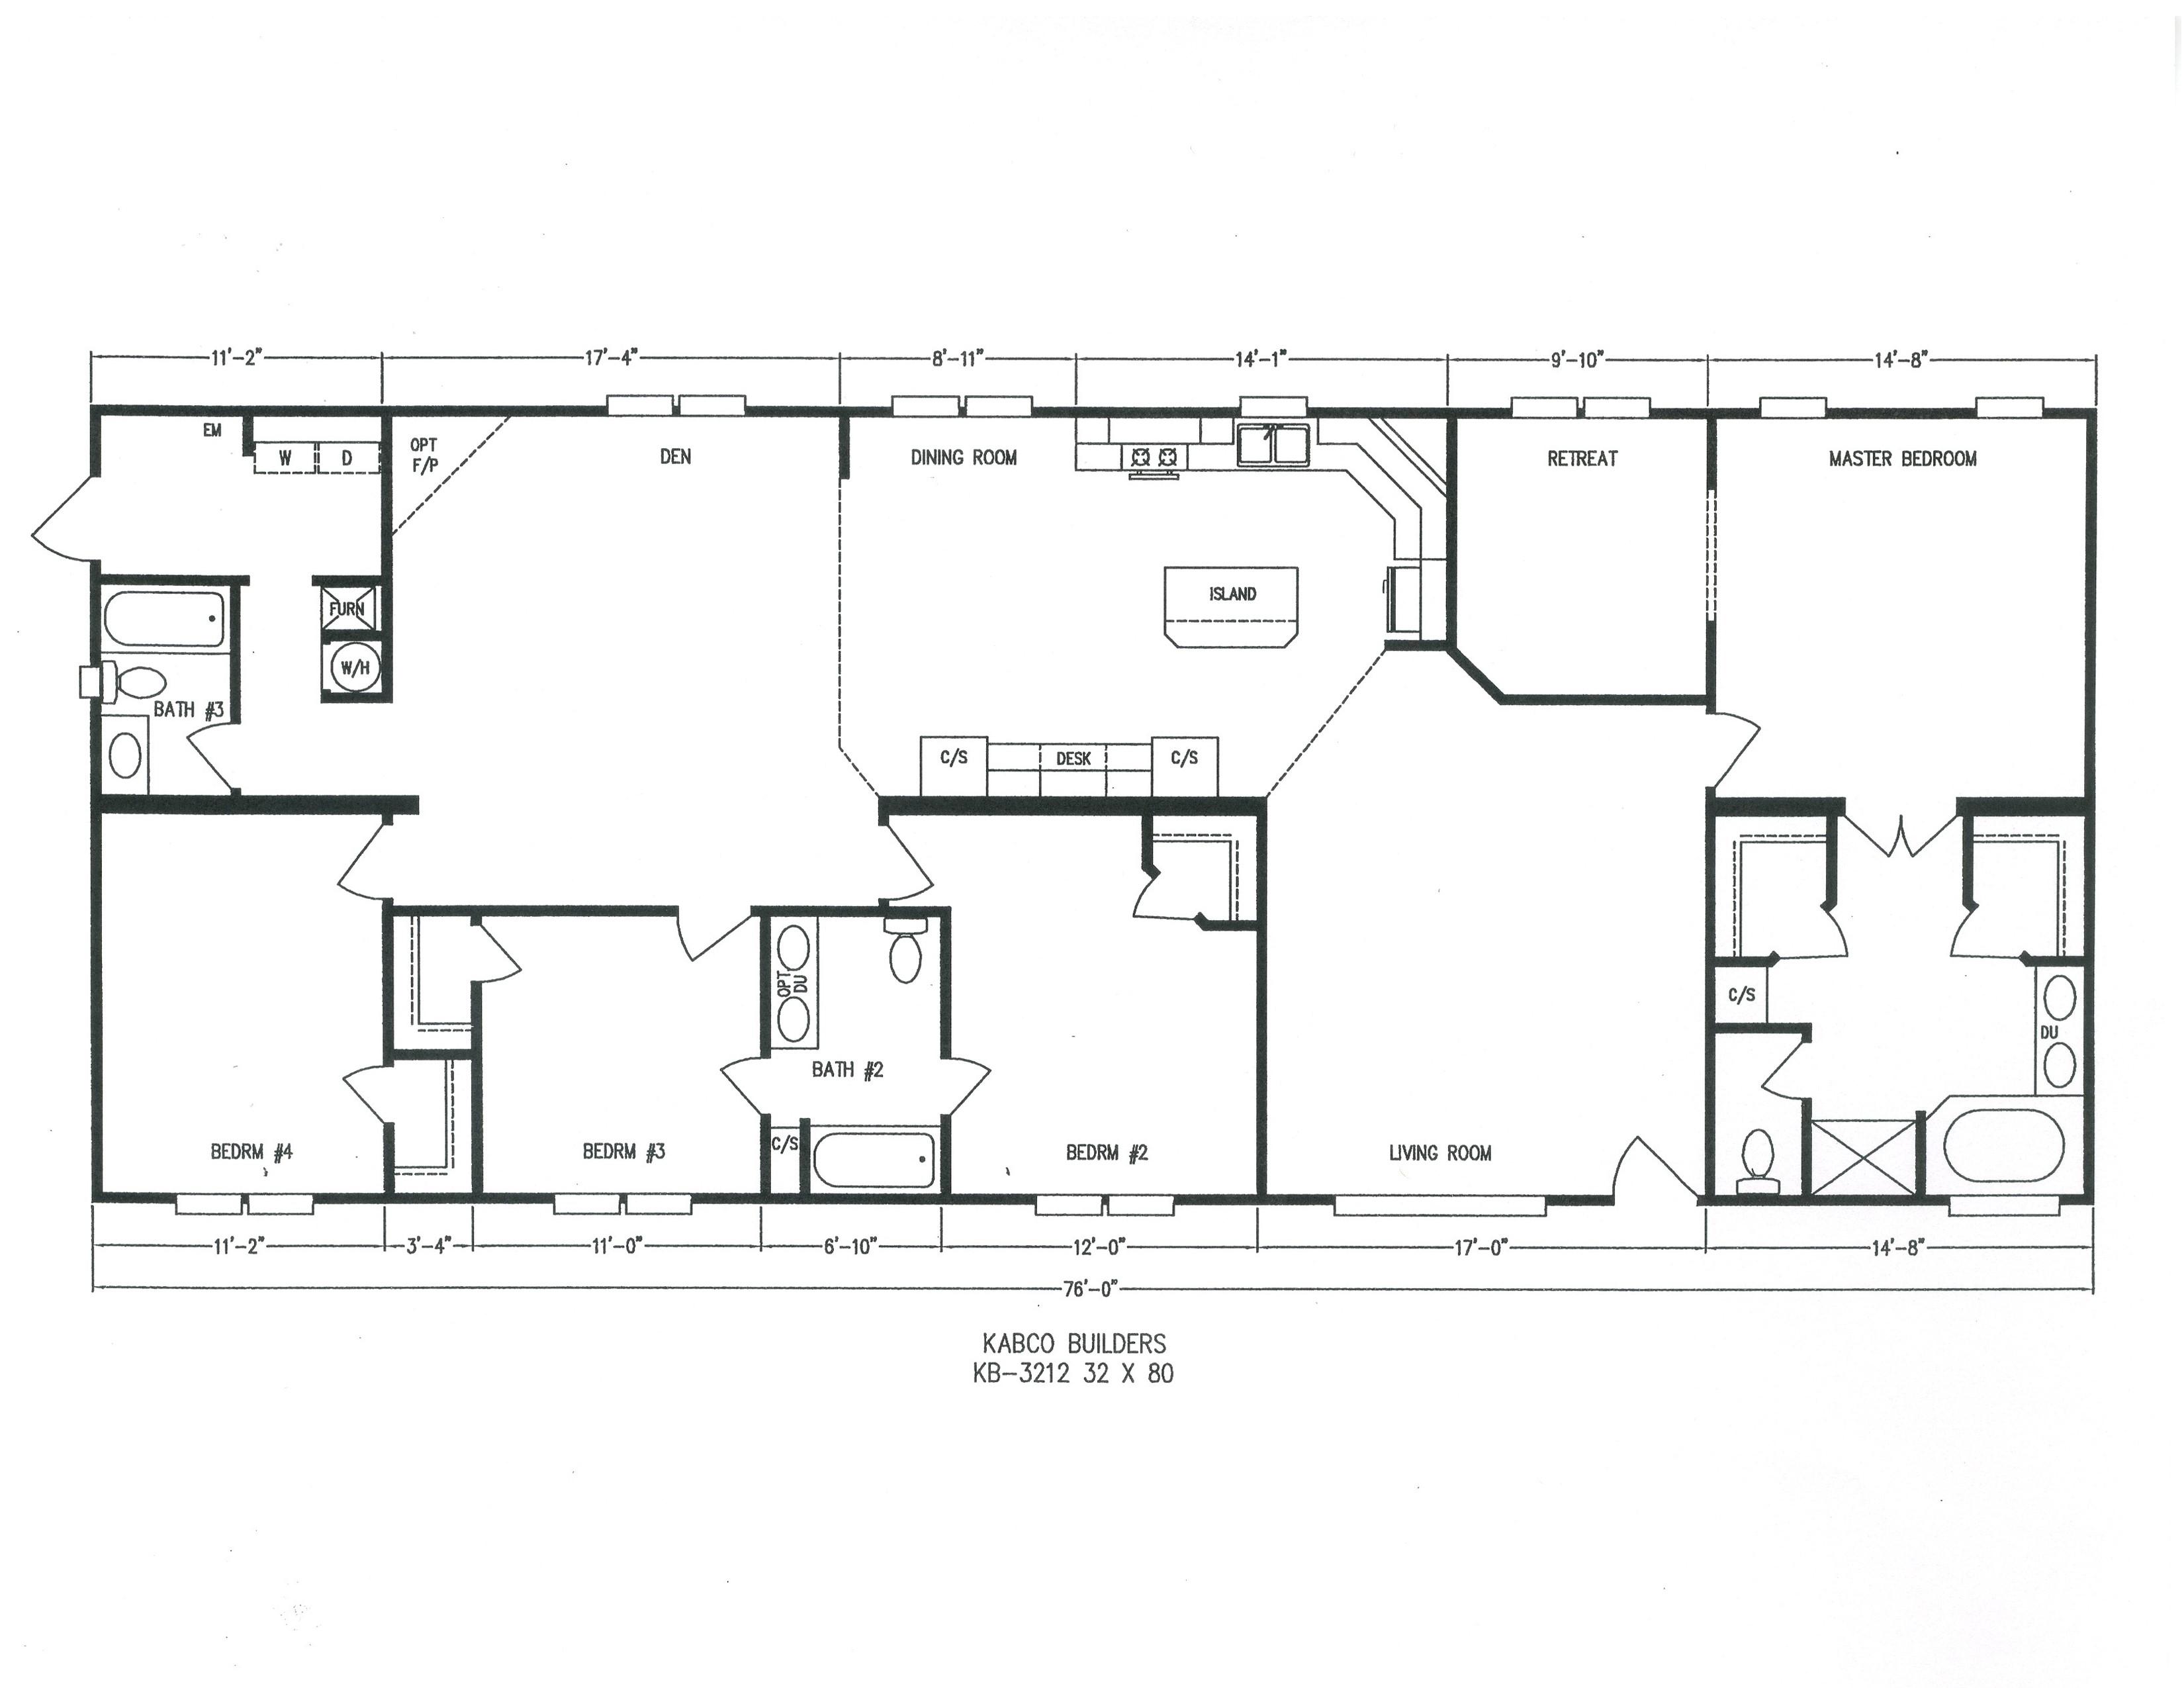 Tandem Home Center in Tyler, TX - Manufactured Home Dealer on